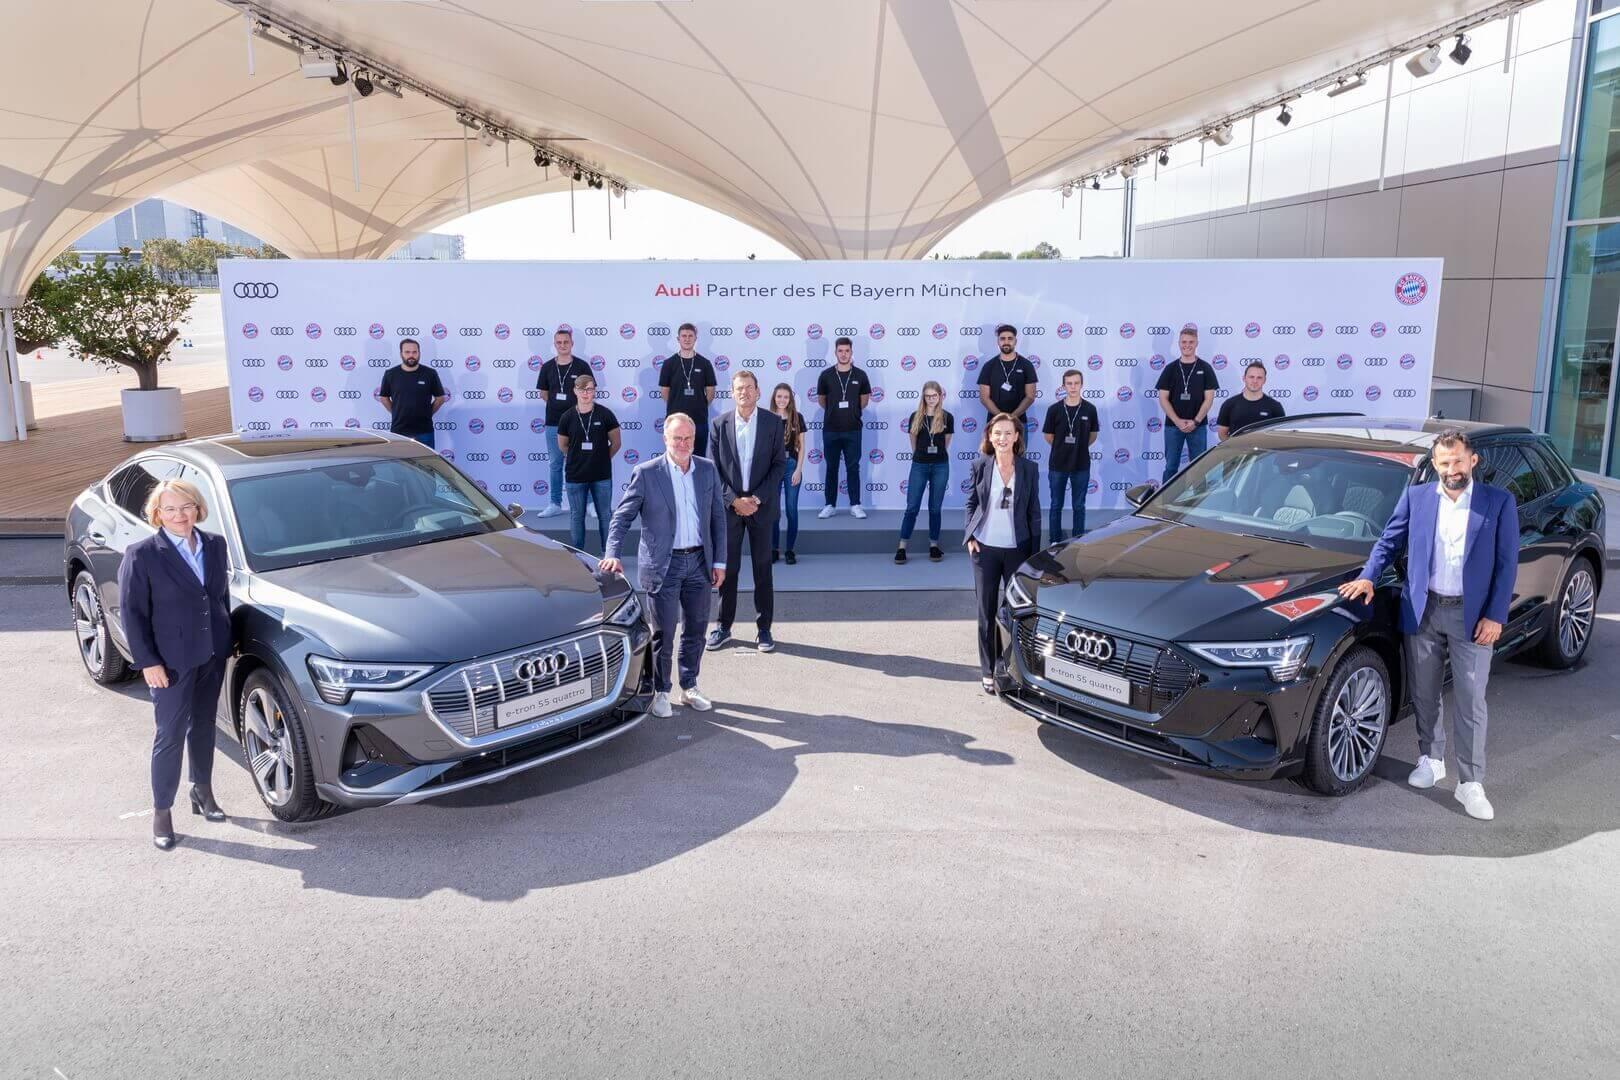 Audi электрифицировала ФК «Бавария» Мюнхен